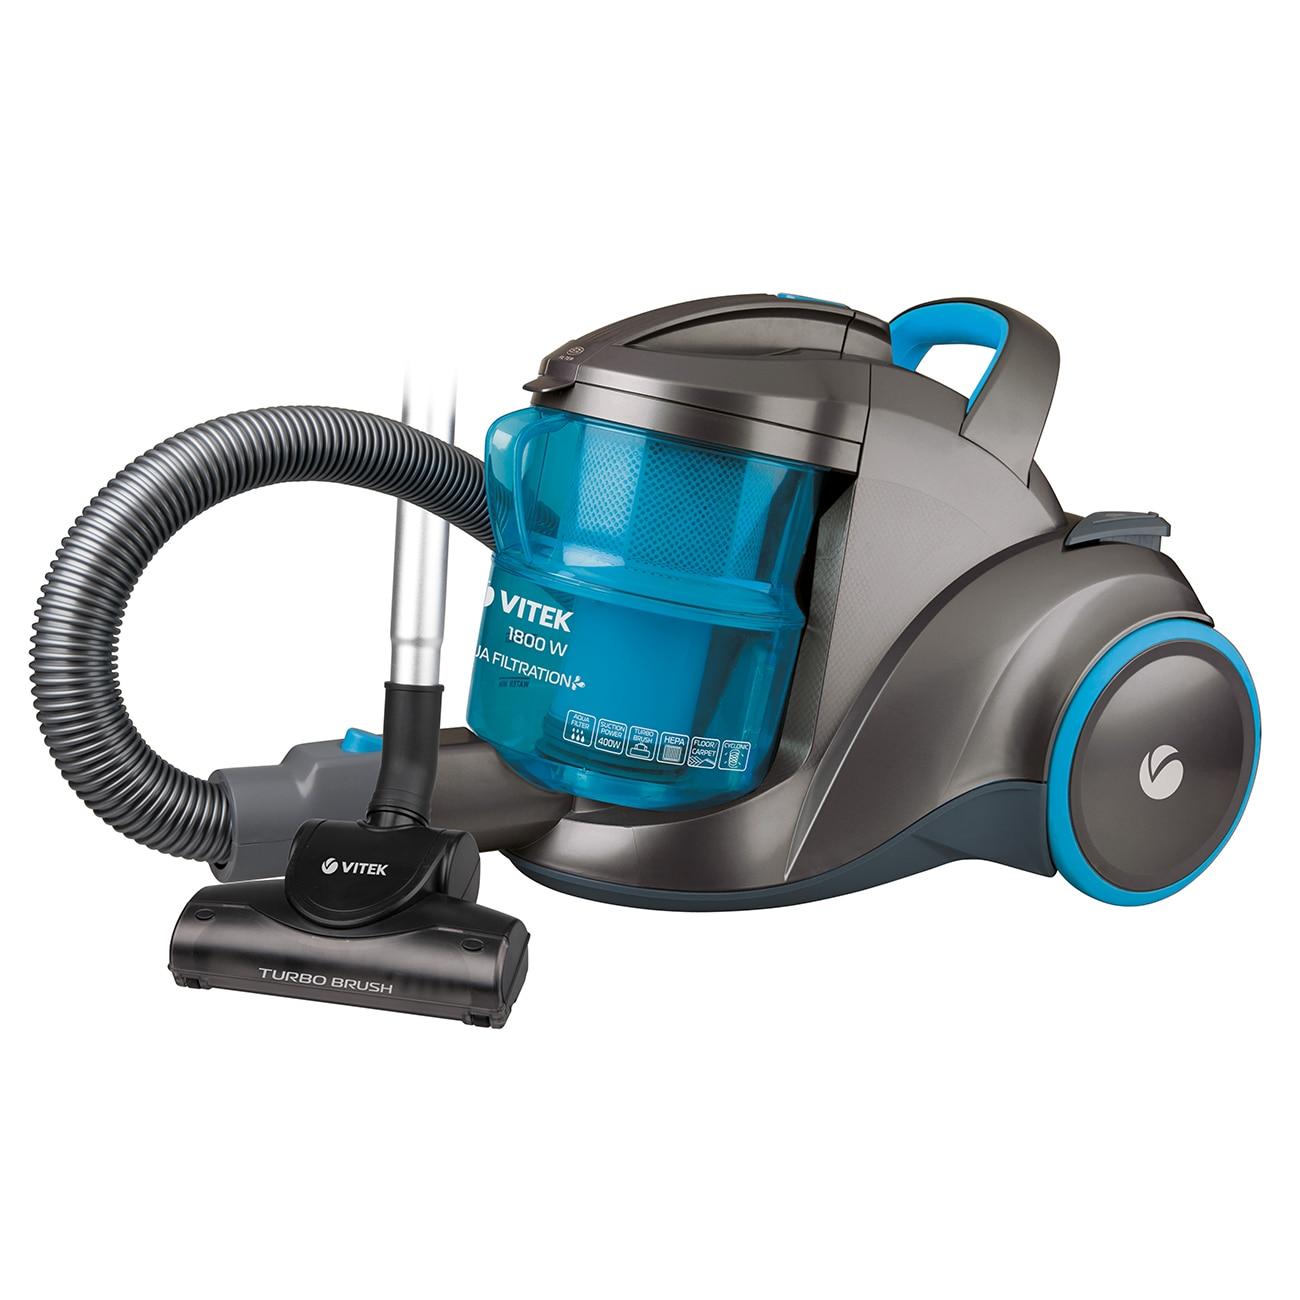 Electric vacuum cleaner Vitek VT-1835 B diamond microdermabrasion vacuum suction face skin pores cleaner beauty machine with blue led light anti acne blackhead remove